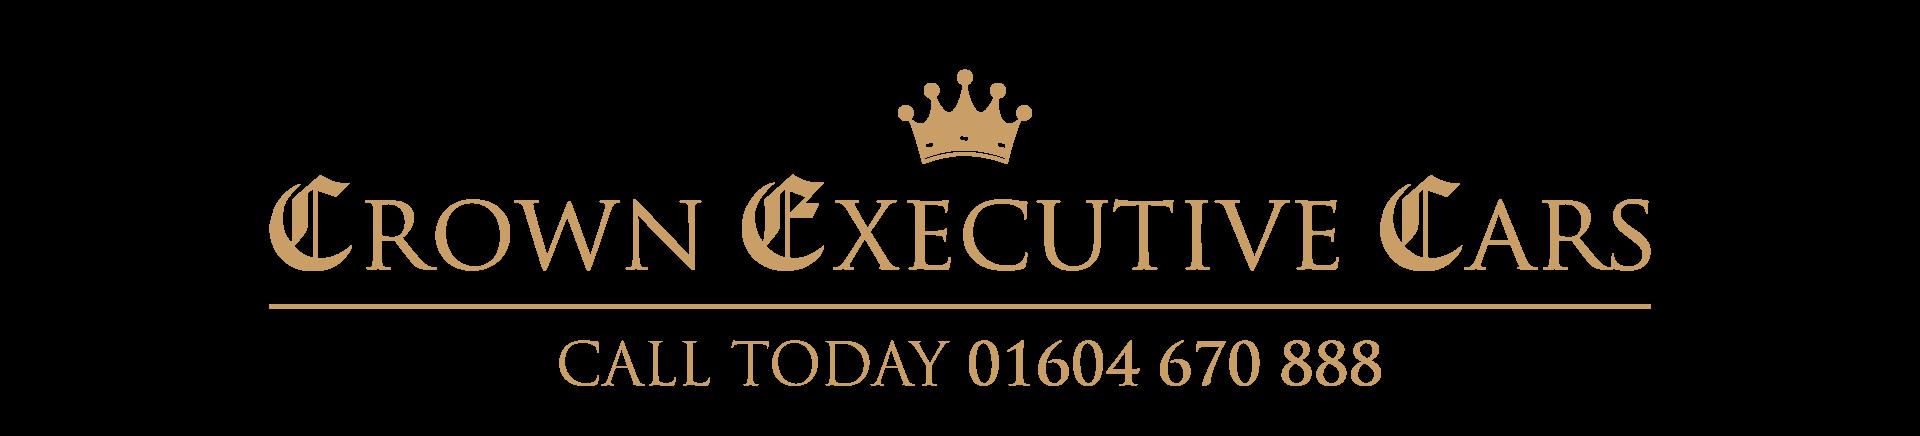 Crown Executive Cars